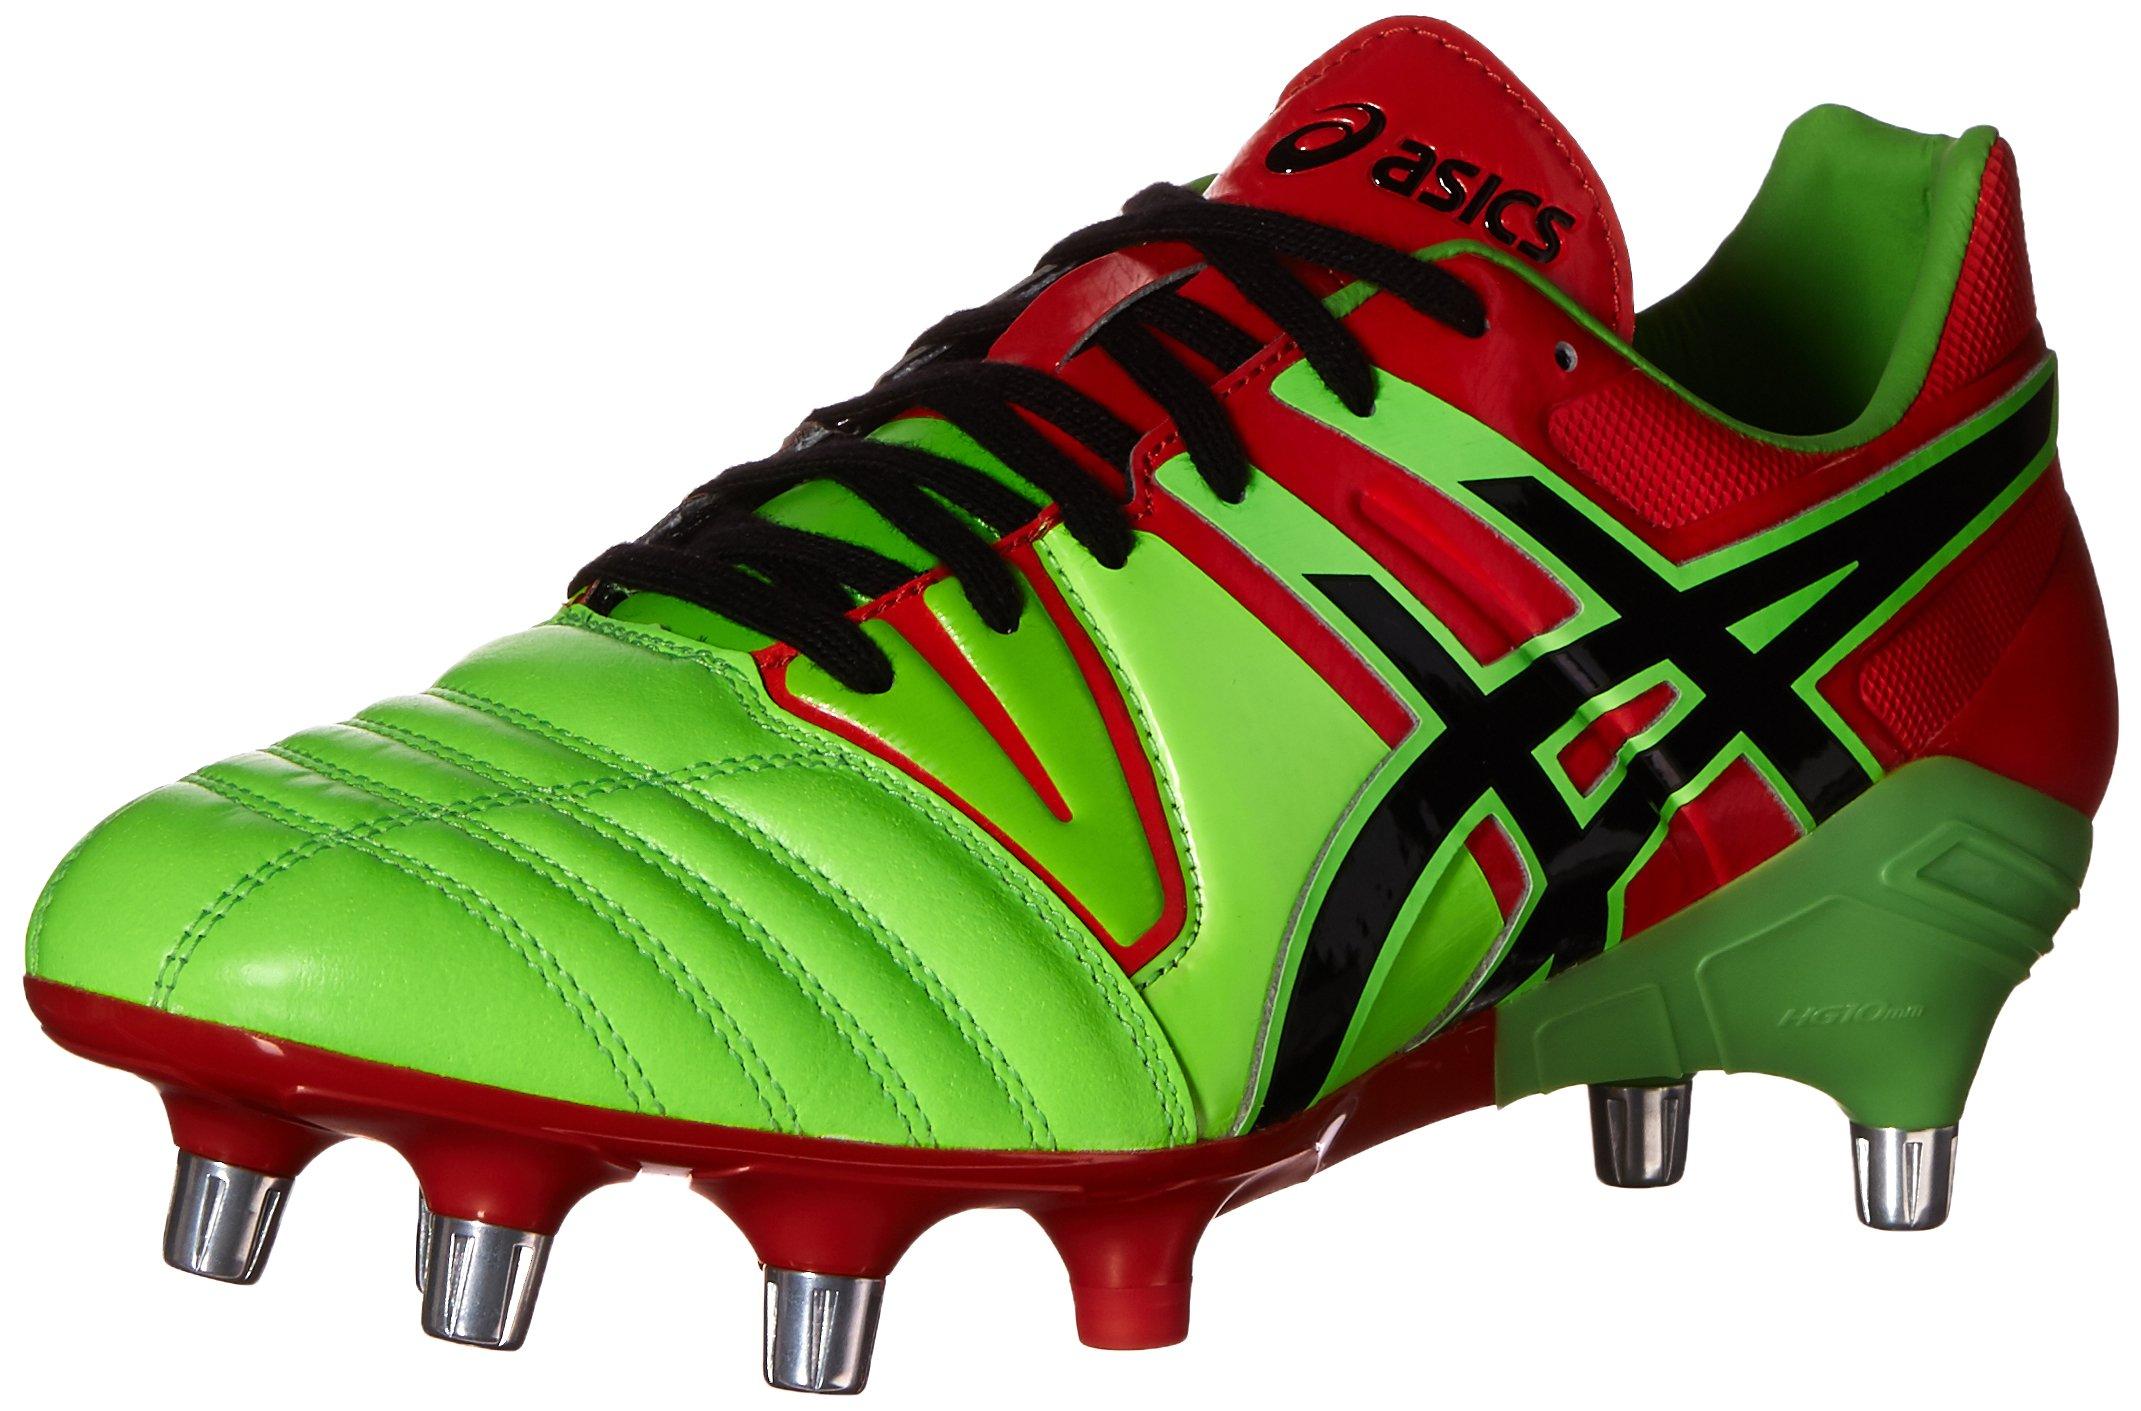 ASICS Men's Gel-Lethal Tight 5 Soccer Shoe,Flash Green/Black/Deep Orange,12 M US